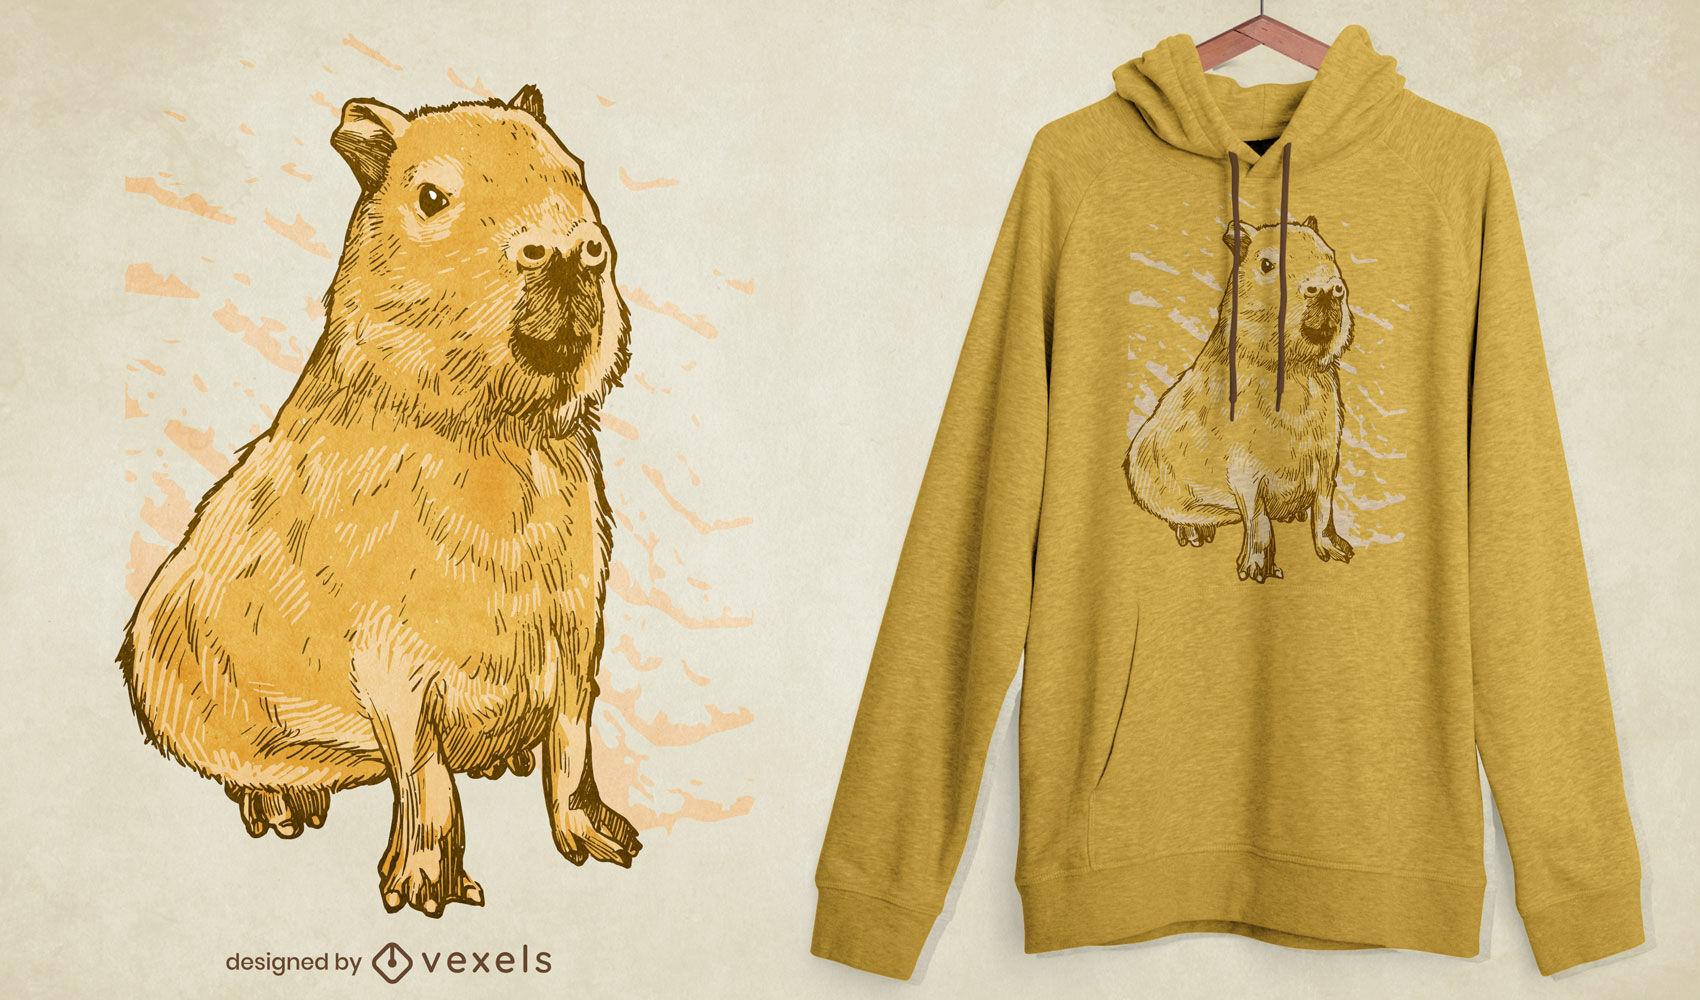 Diseño de camiseta animal de capibara realista.